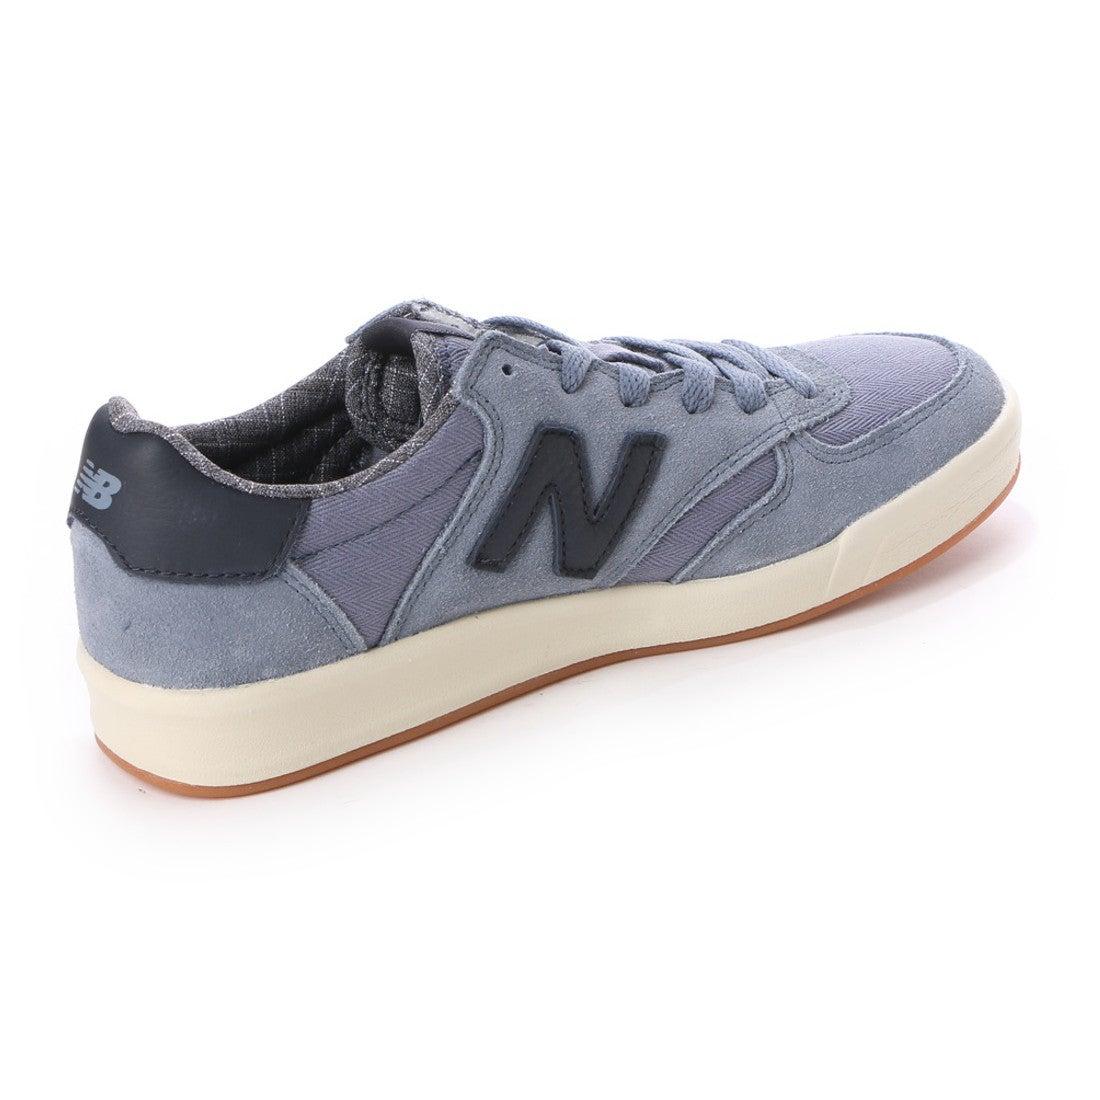 b1ac486cb260b ニューバランス new balance NB CRT300 RA (ネイビー) -靴&ファッション通販 ロコンド〜自宅で試着、気軽に返品